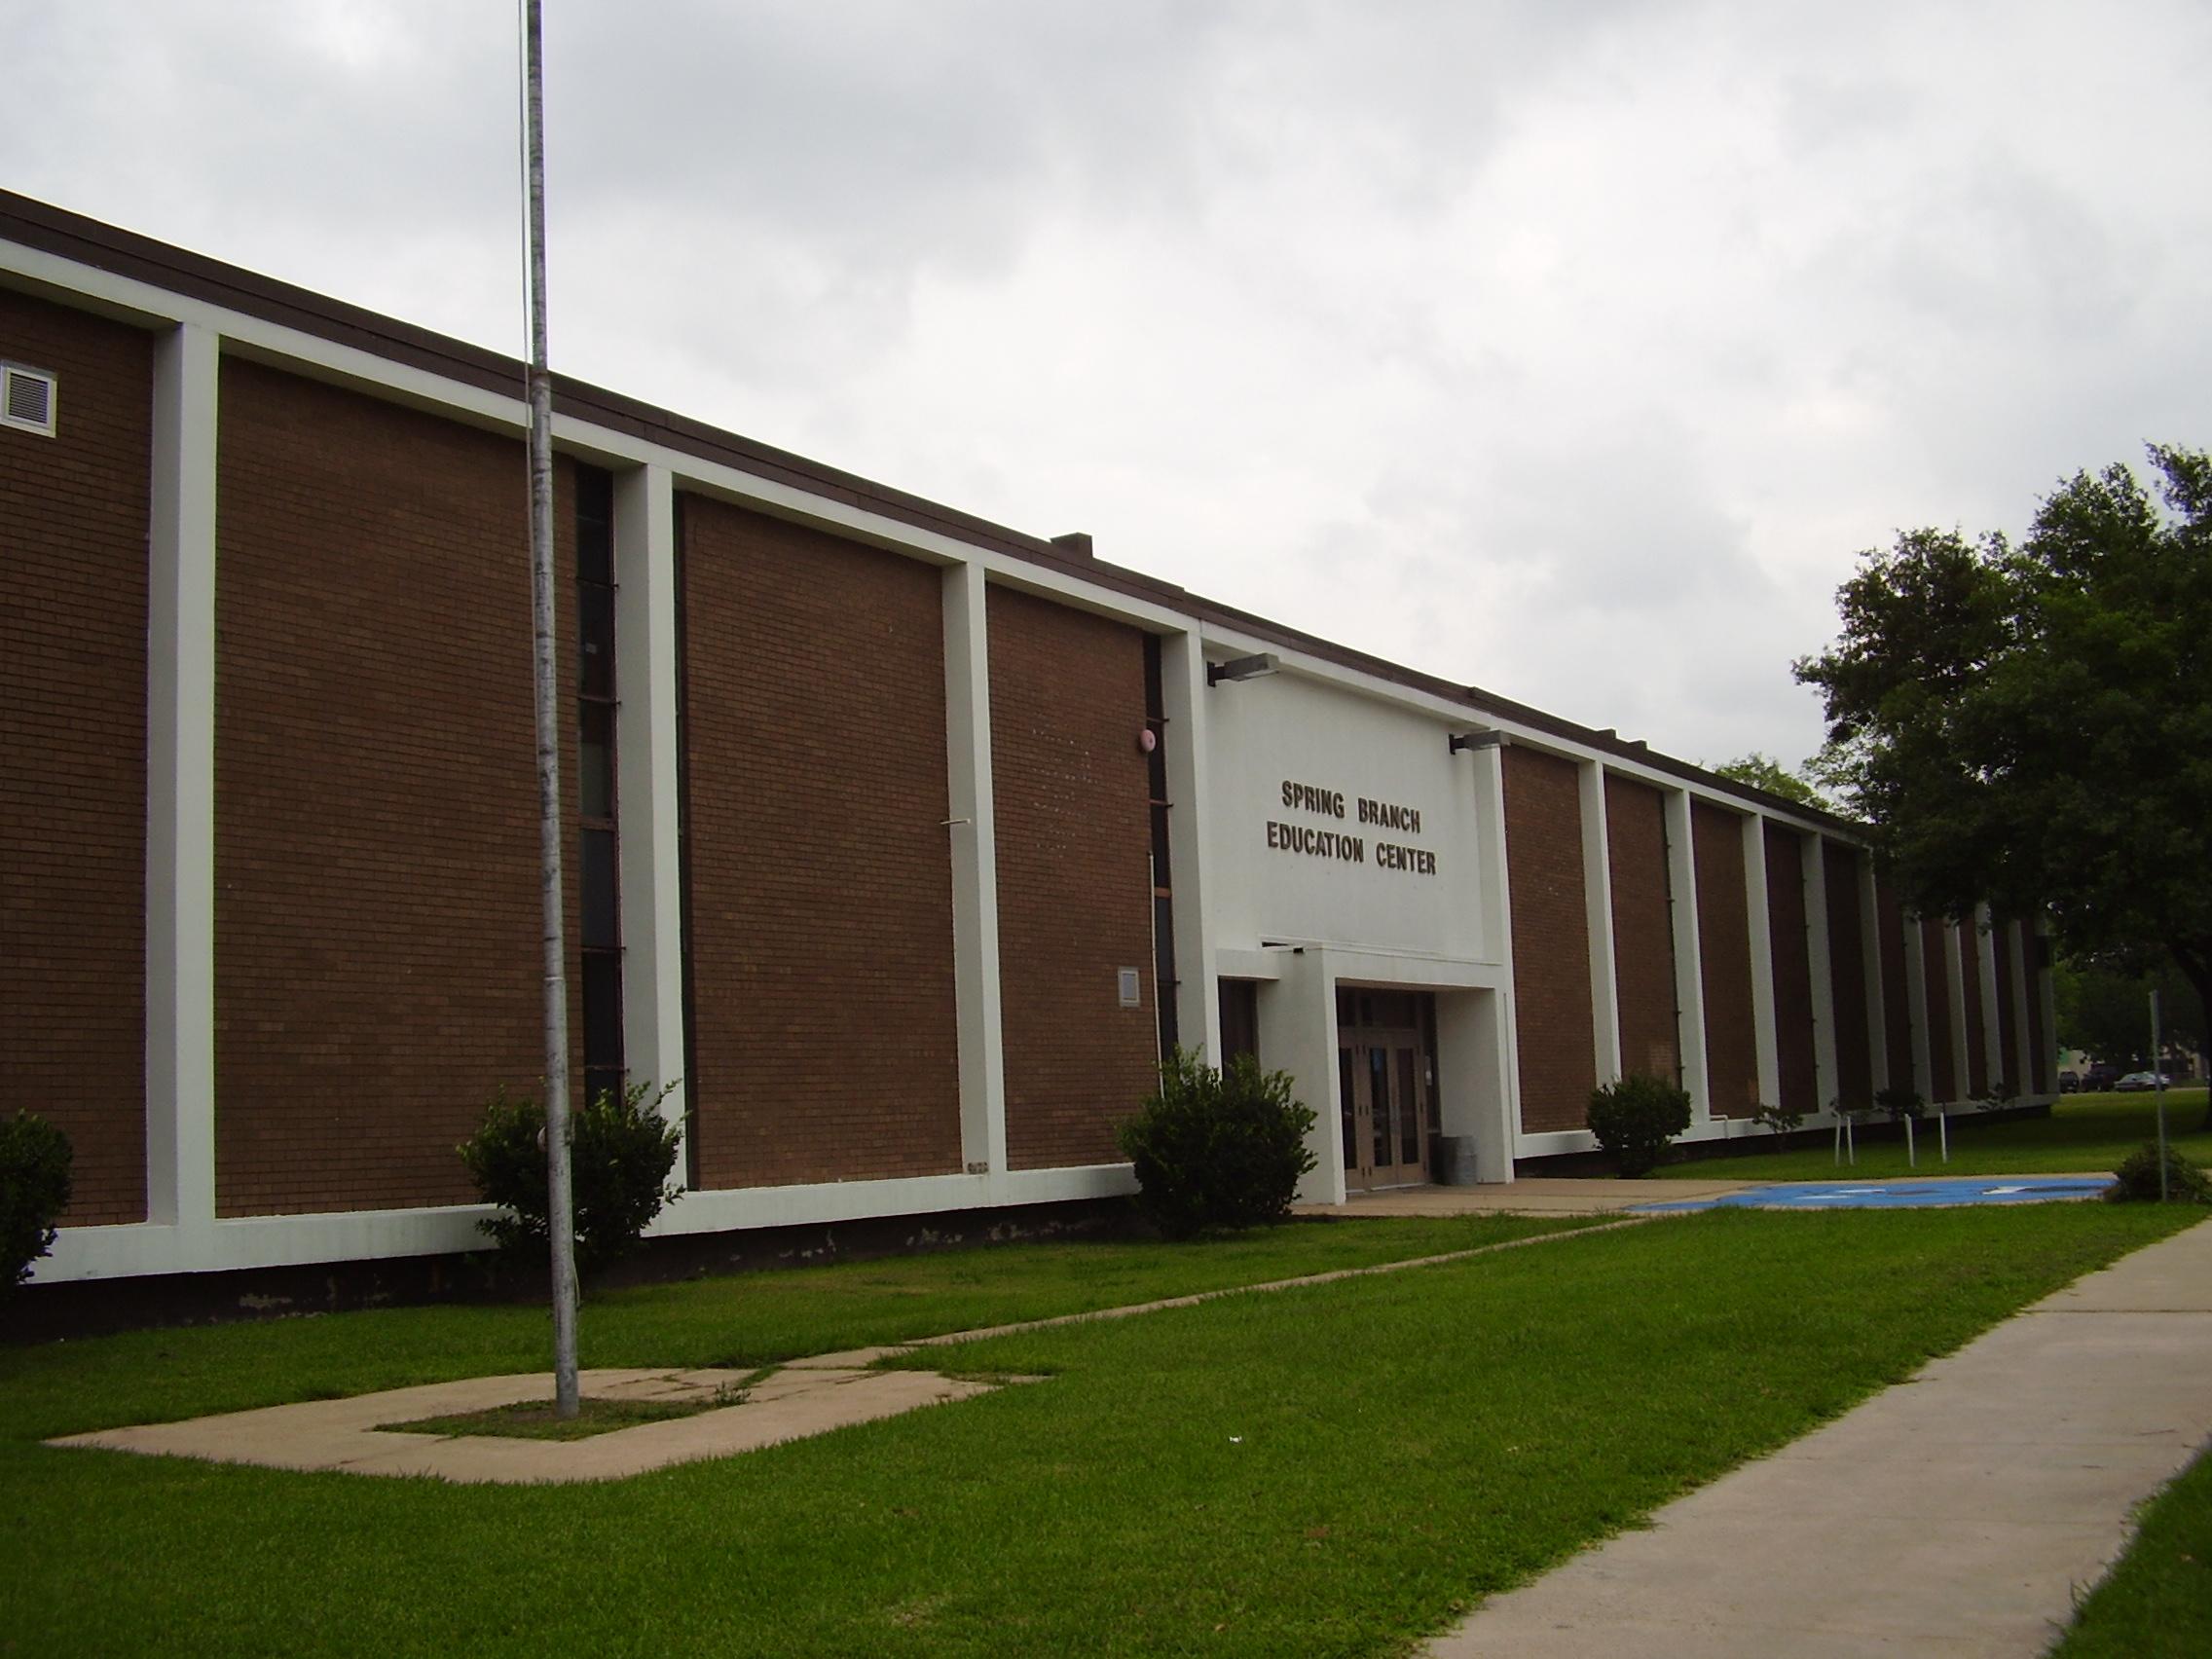 Spring Branch School Of Choice Wikipedia